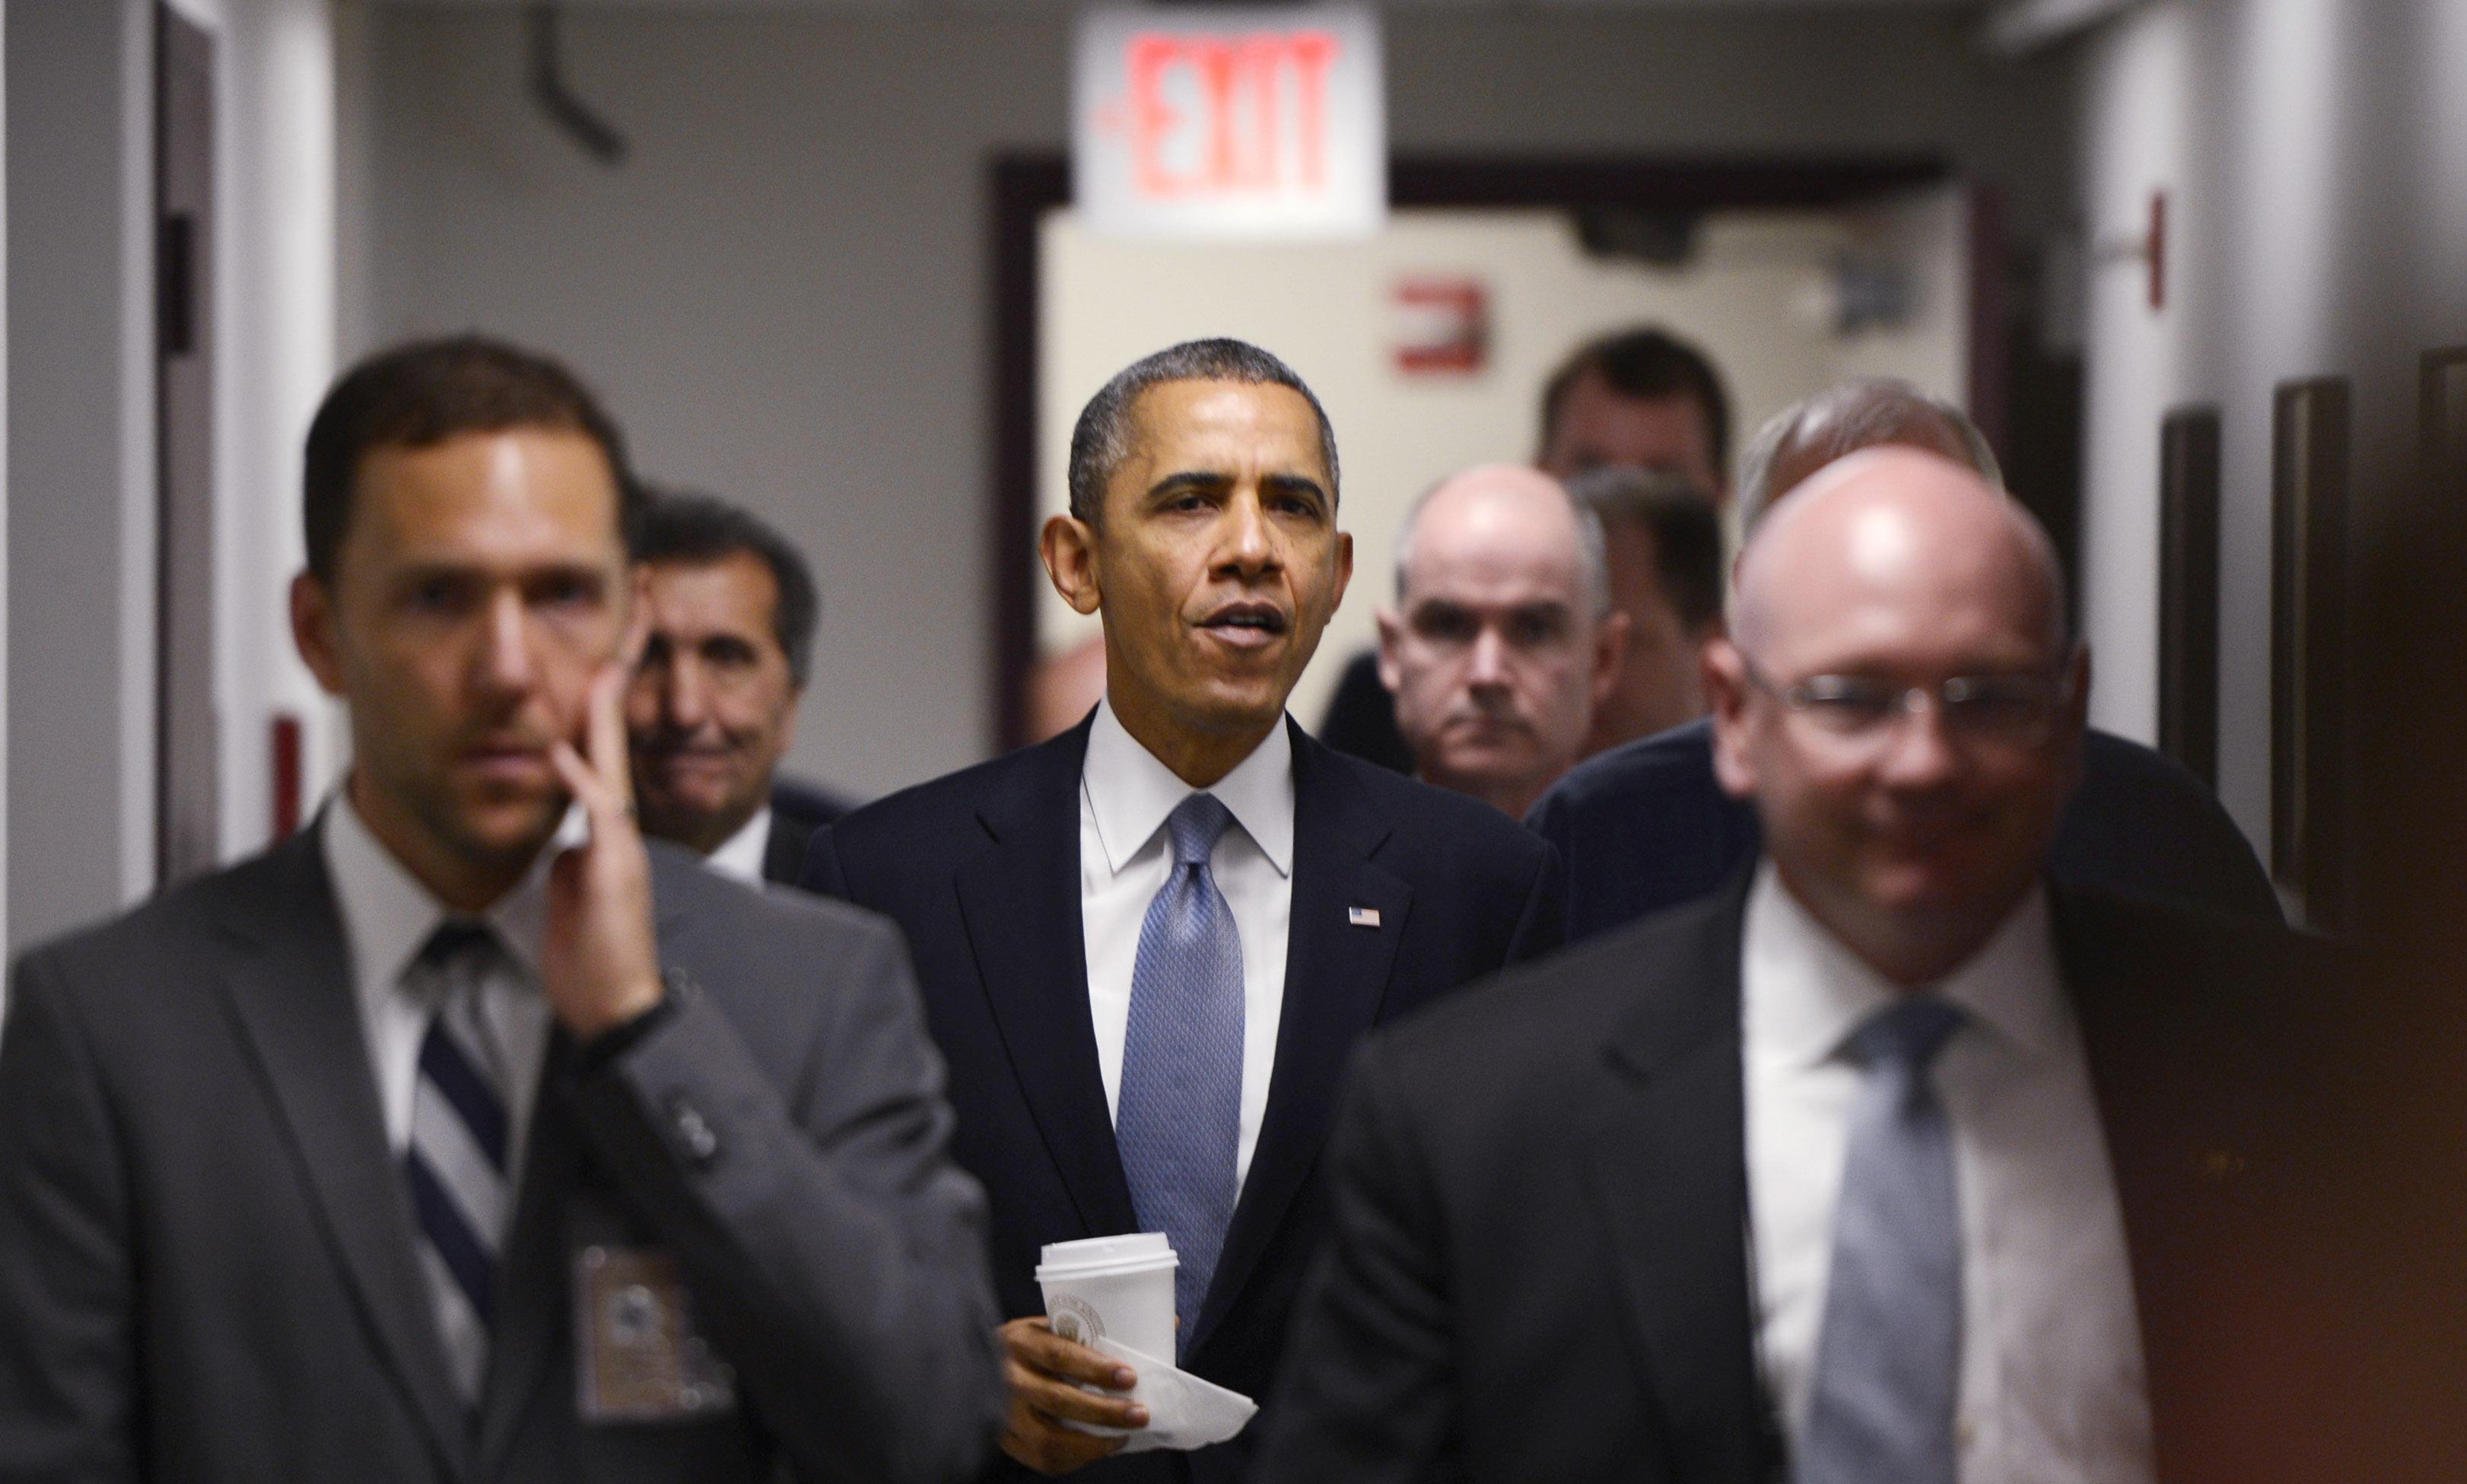 Raids Project Presidential Power Amid Shutdown's Gridlock